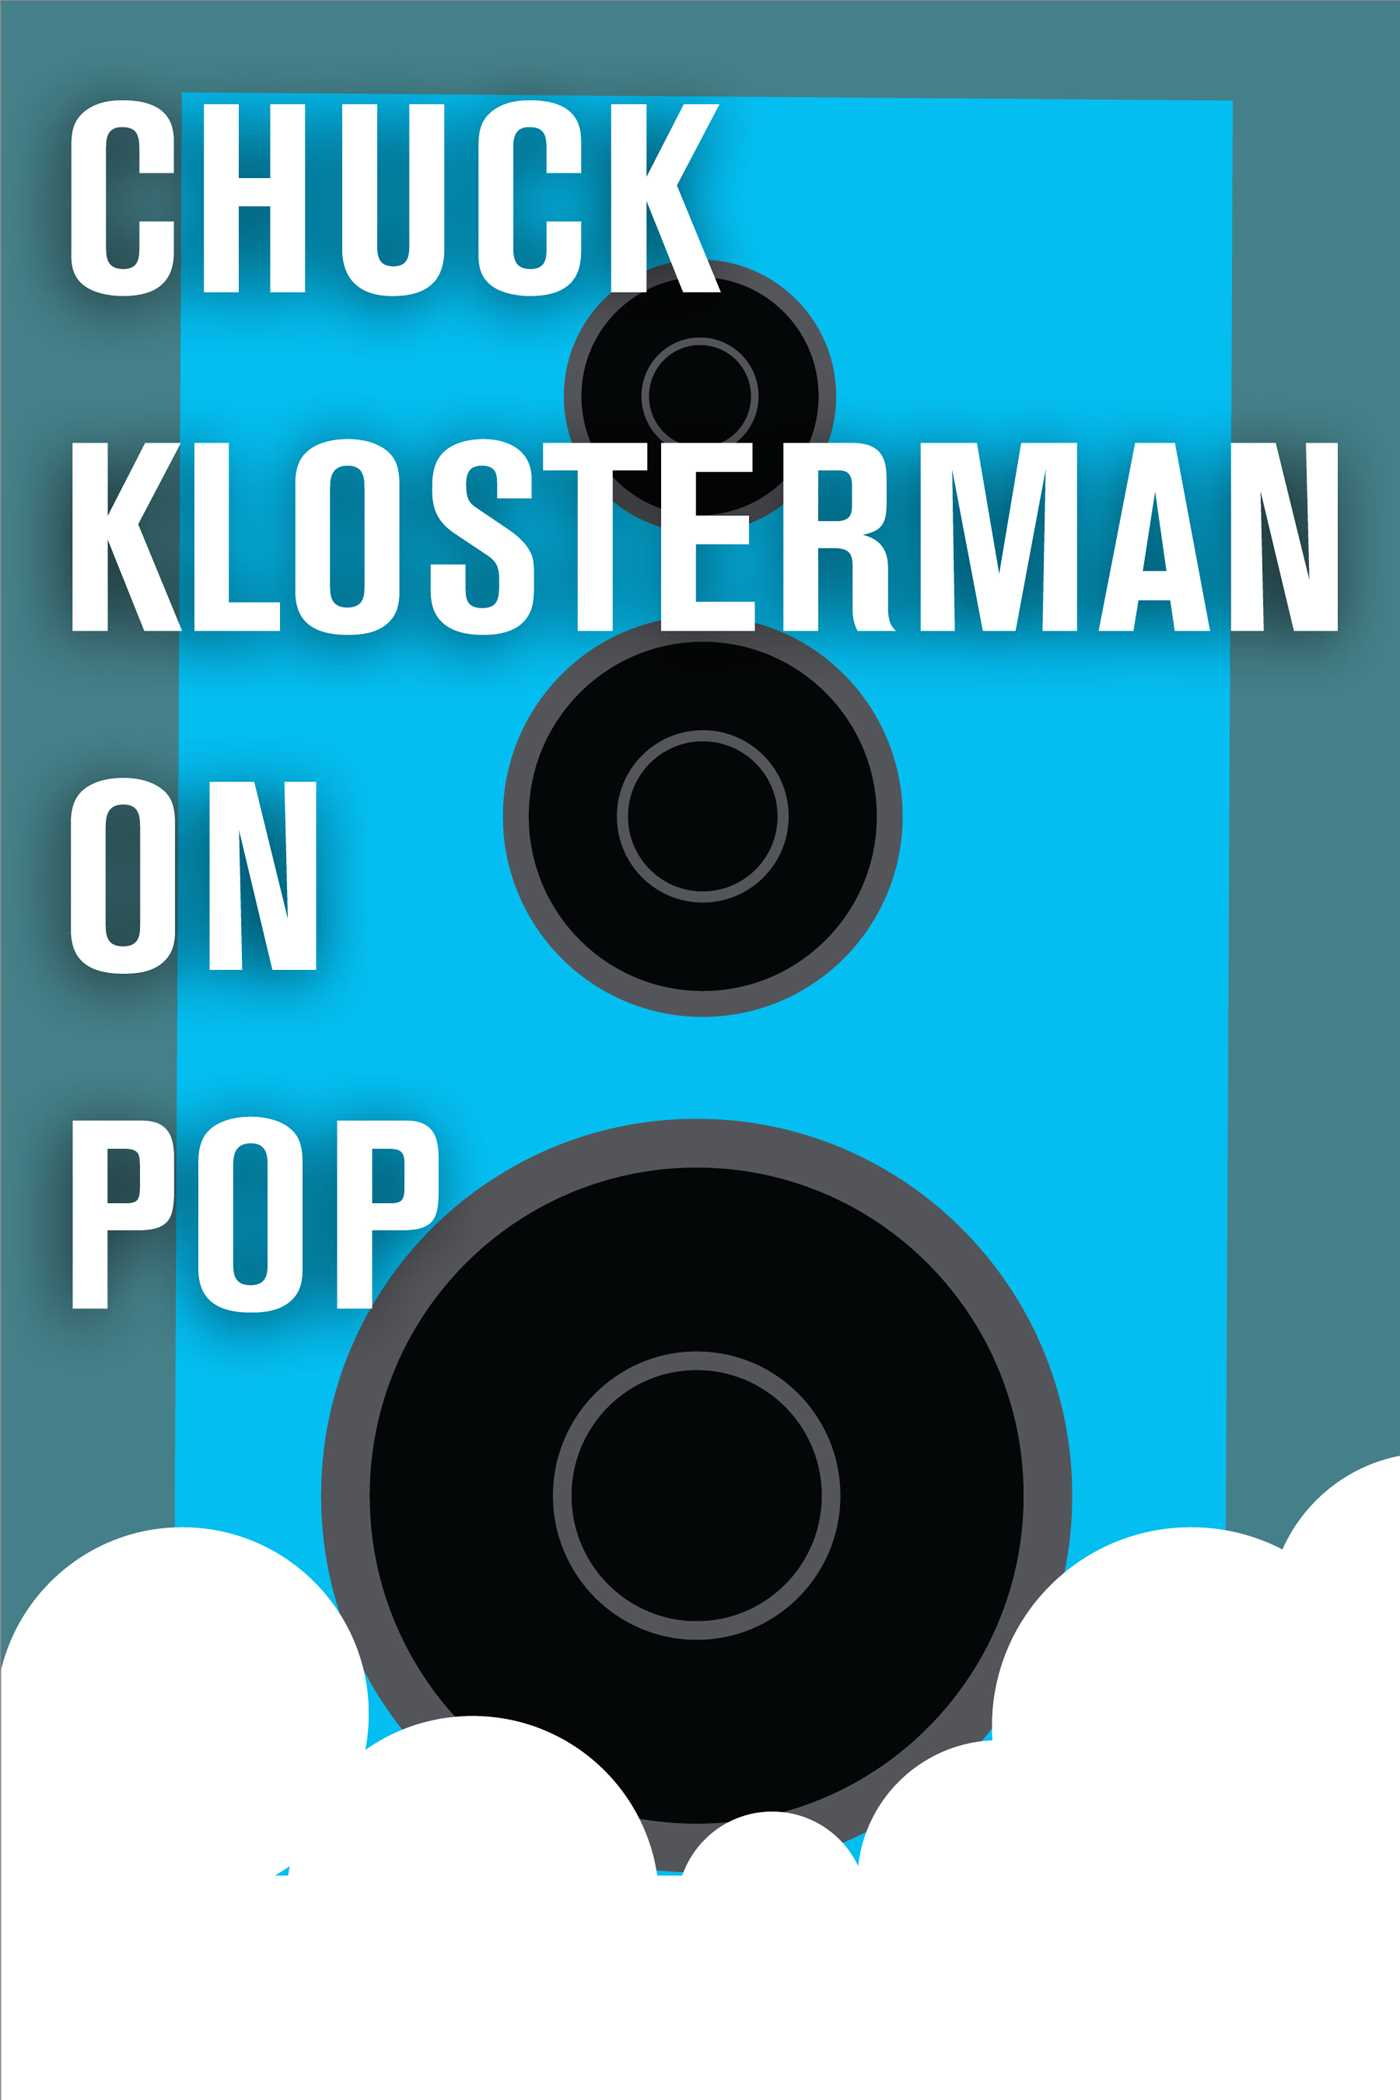 Chuck klosterman on pop 9781451624779 hr